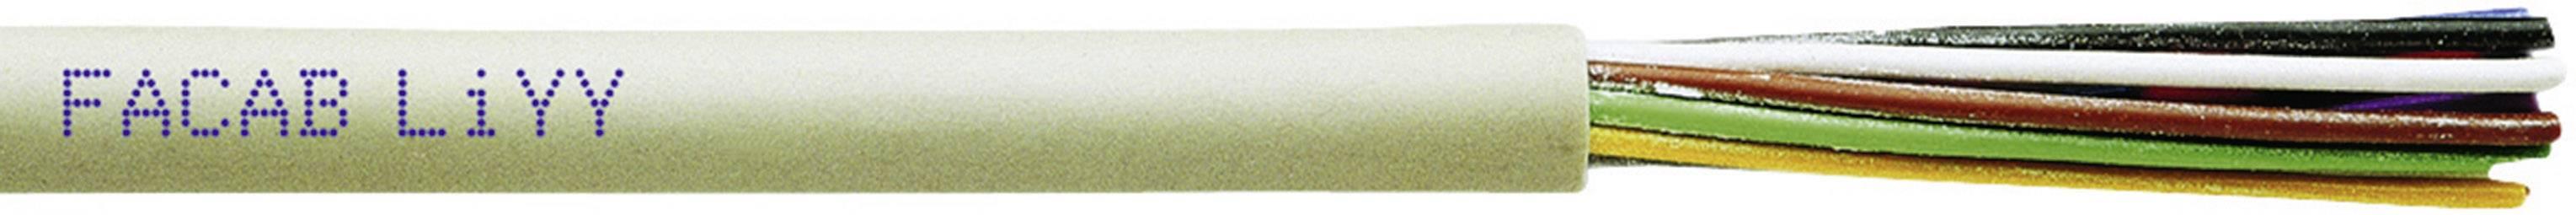 Riadiaci kábel Faber Kabel LiYY 030201, 5 x 0.25 mm², vonkajší Ø 4.50 mm, 250 V, metrový tovar, sivá